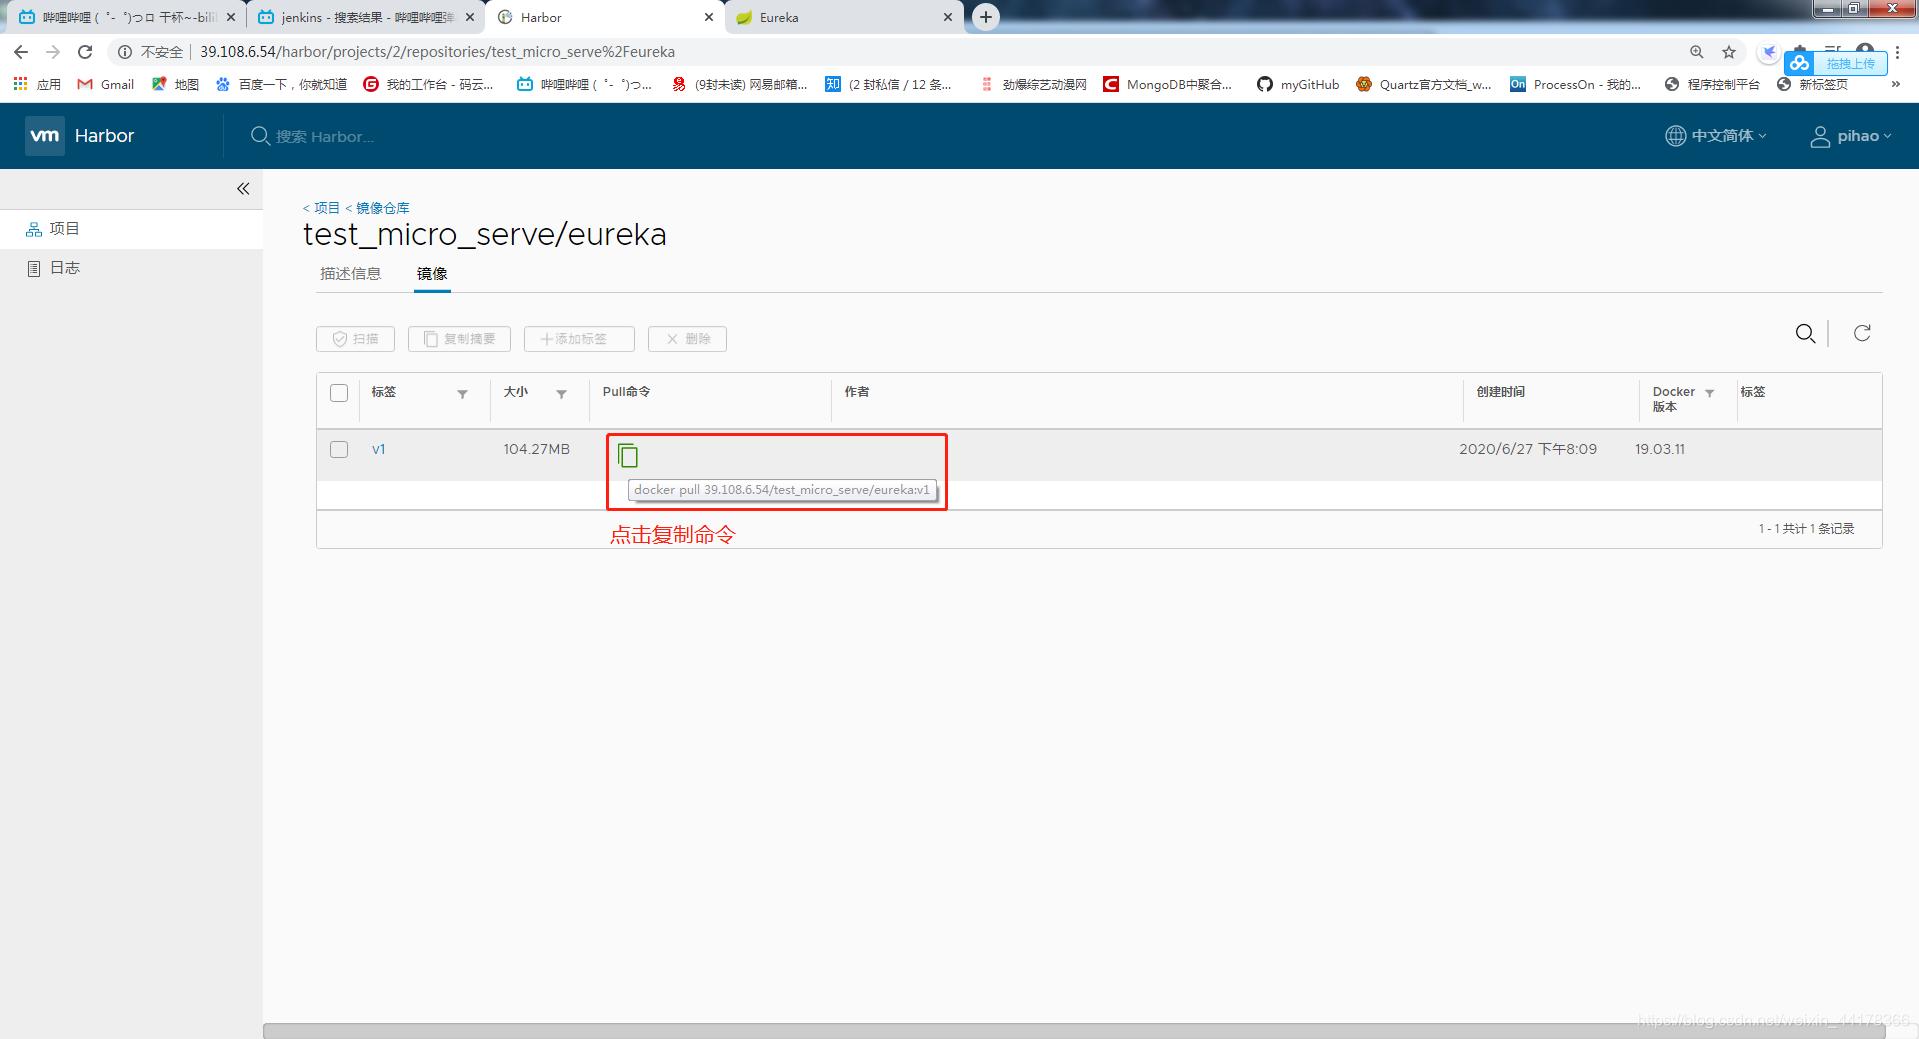 [外链图片转存失败,源站可能有防盗链机制,建议将图片保存下来直接上传(img-3aMkC8Wg-1593263593024)(C:\Users\Administrator\AppData\Roaming\Typora\typora-user-images\image-20200627205202955.png)]